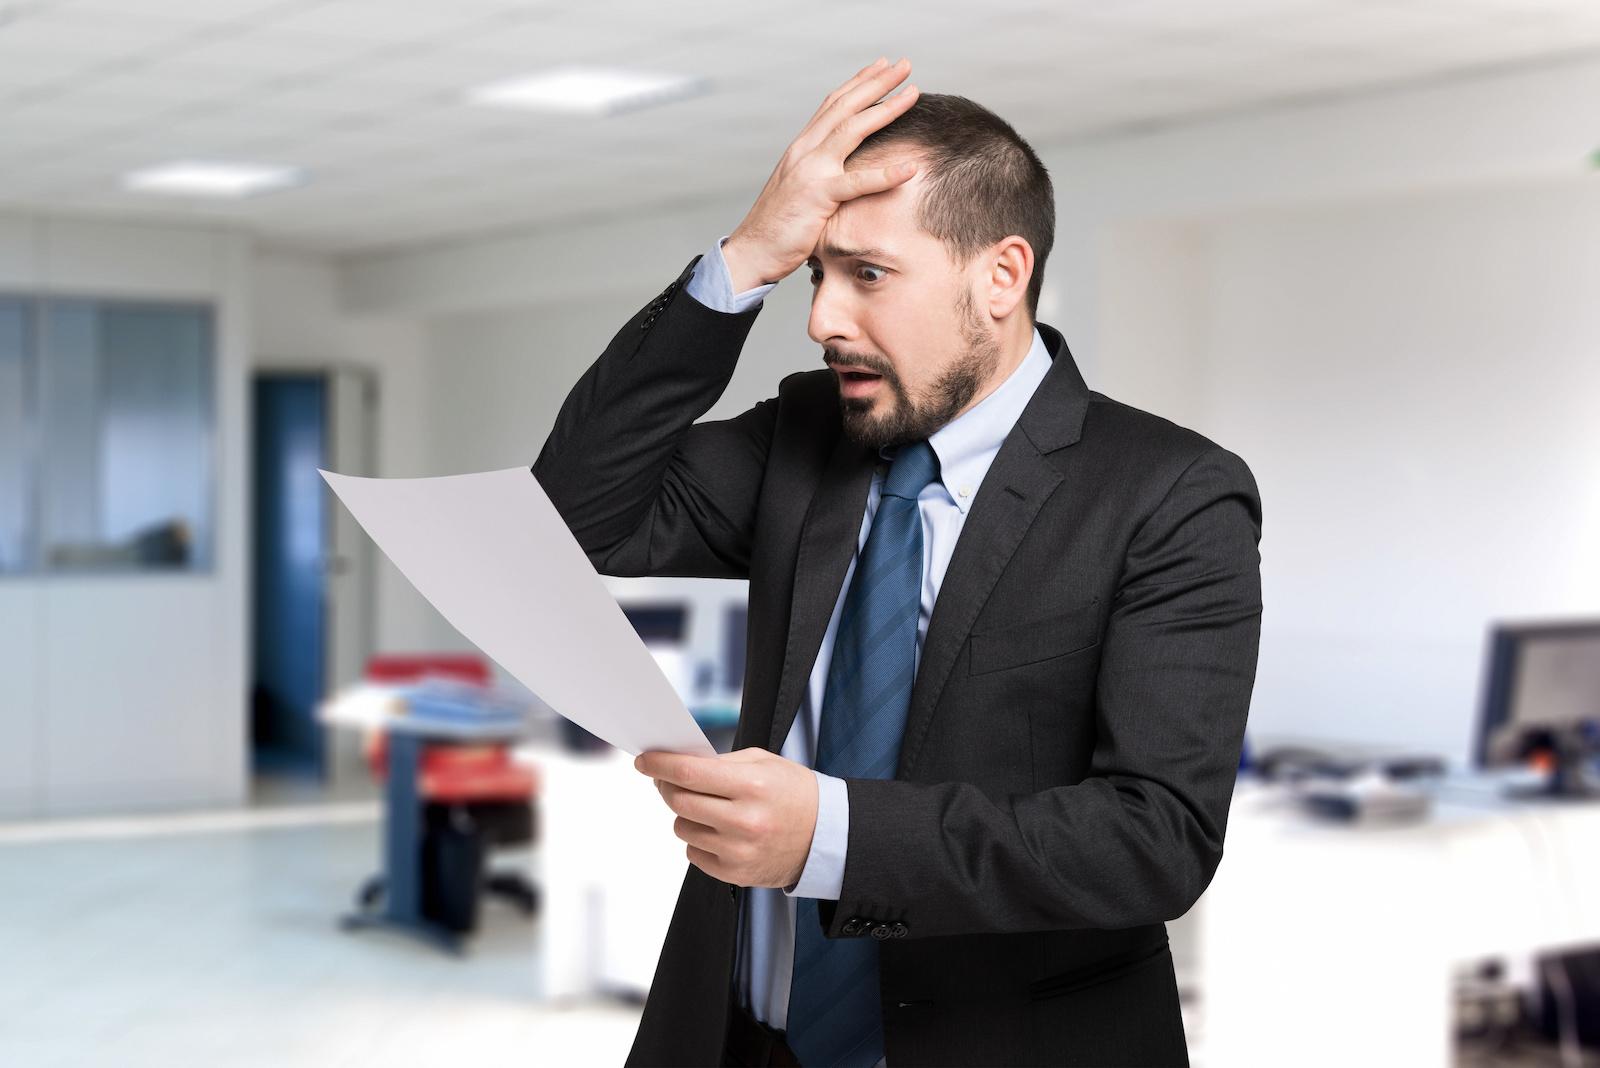 Desperate man reading a document